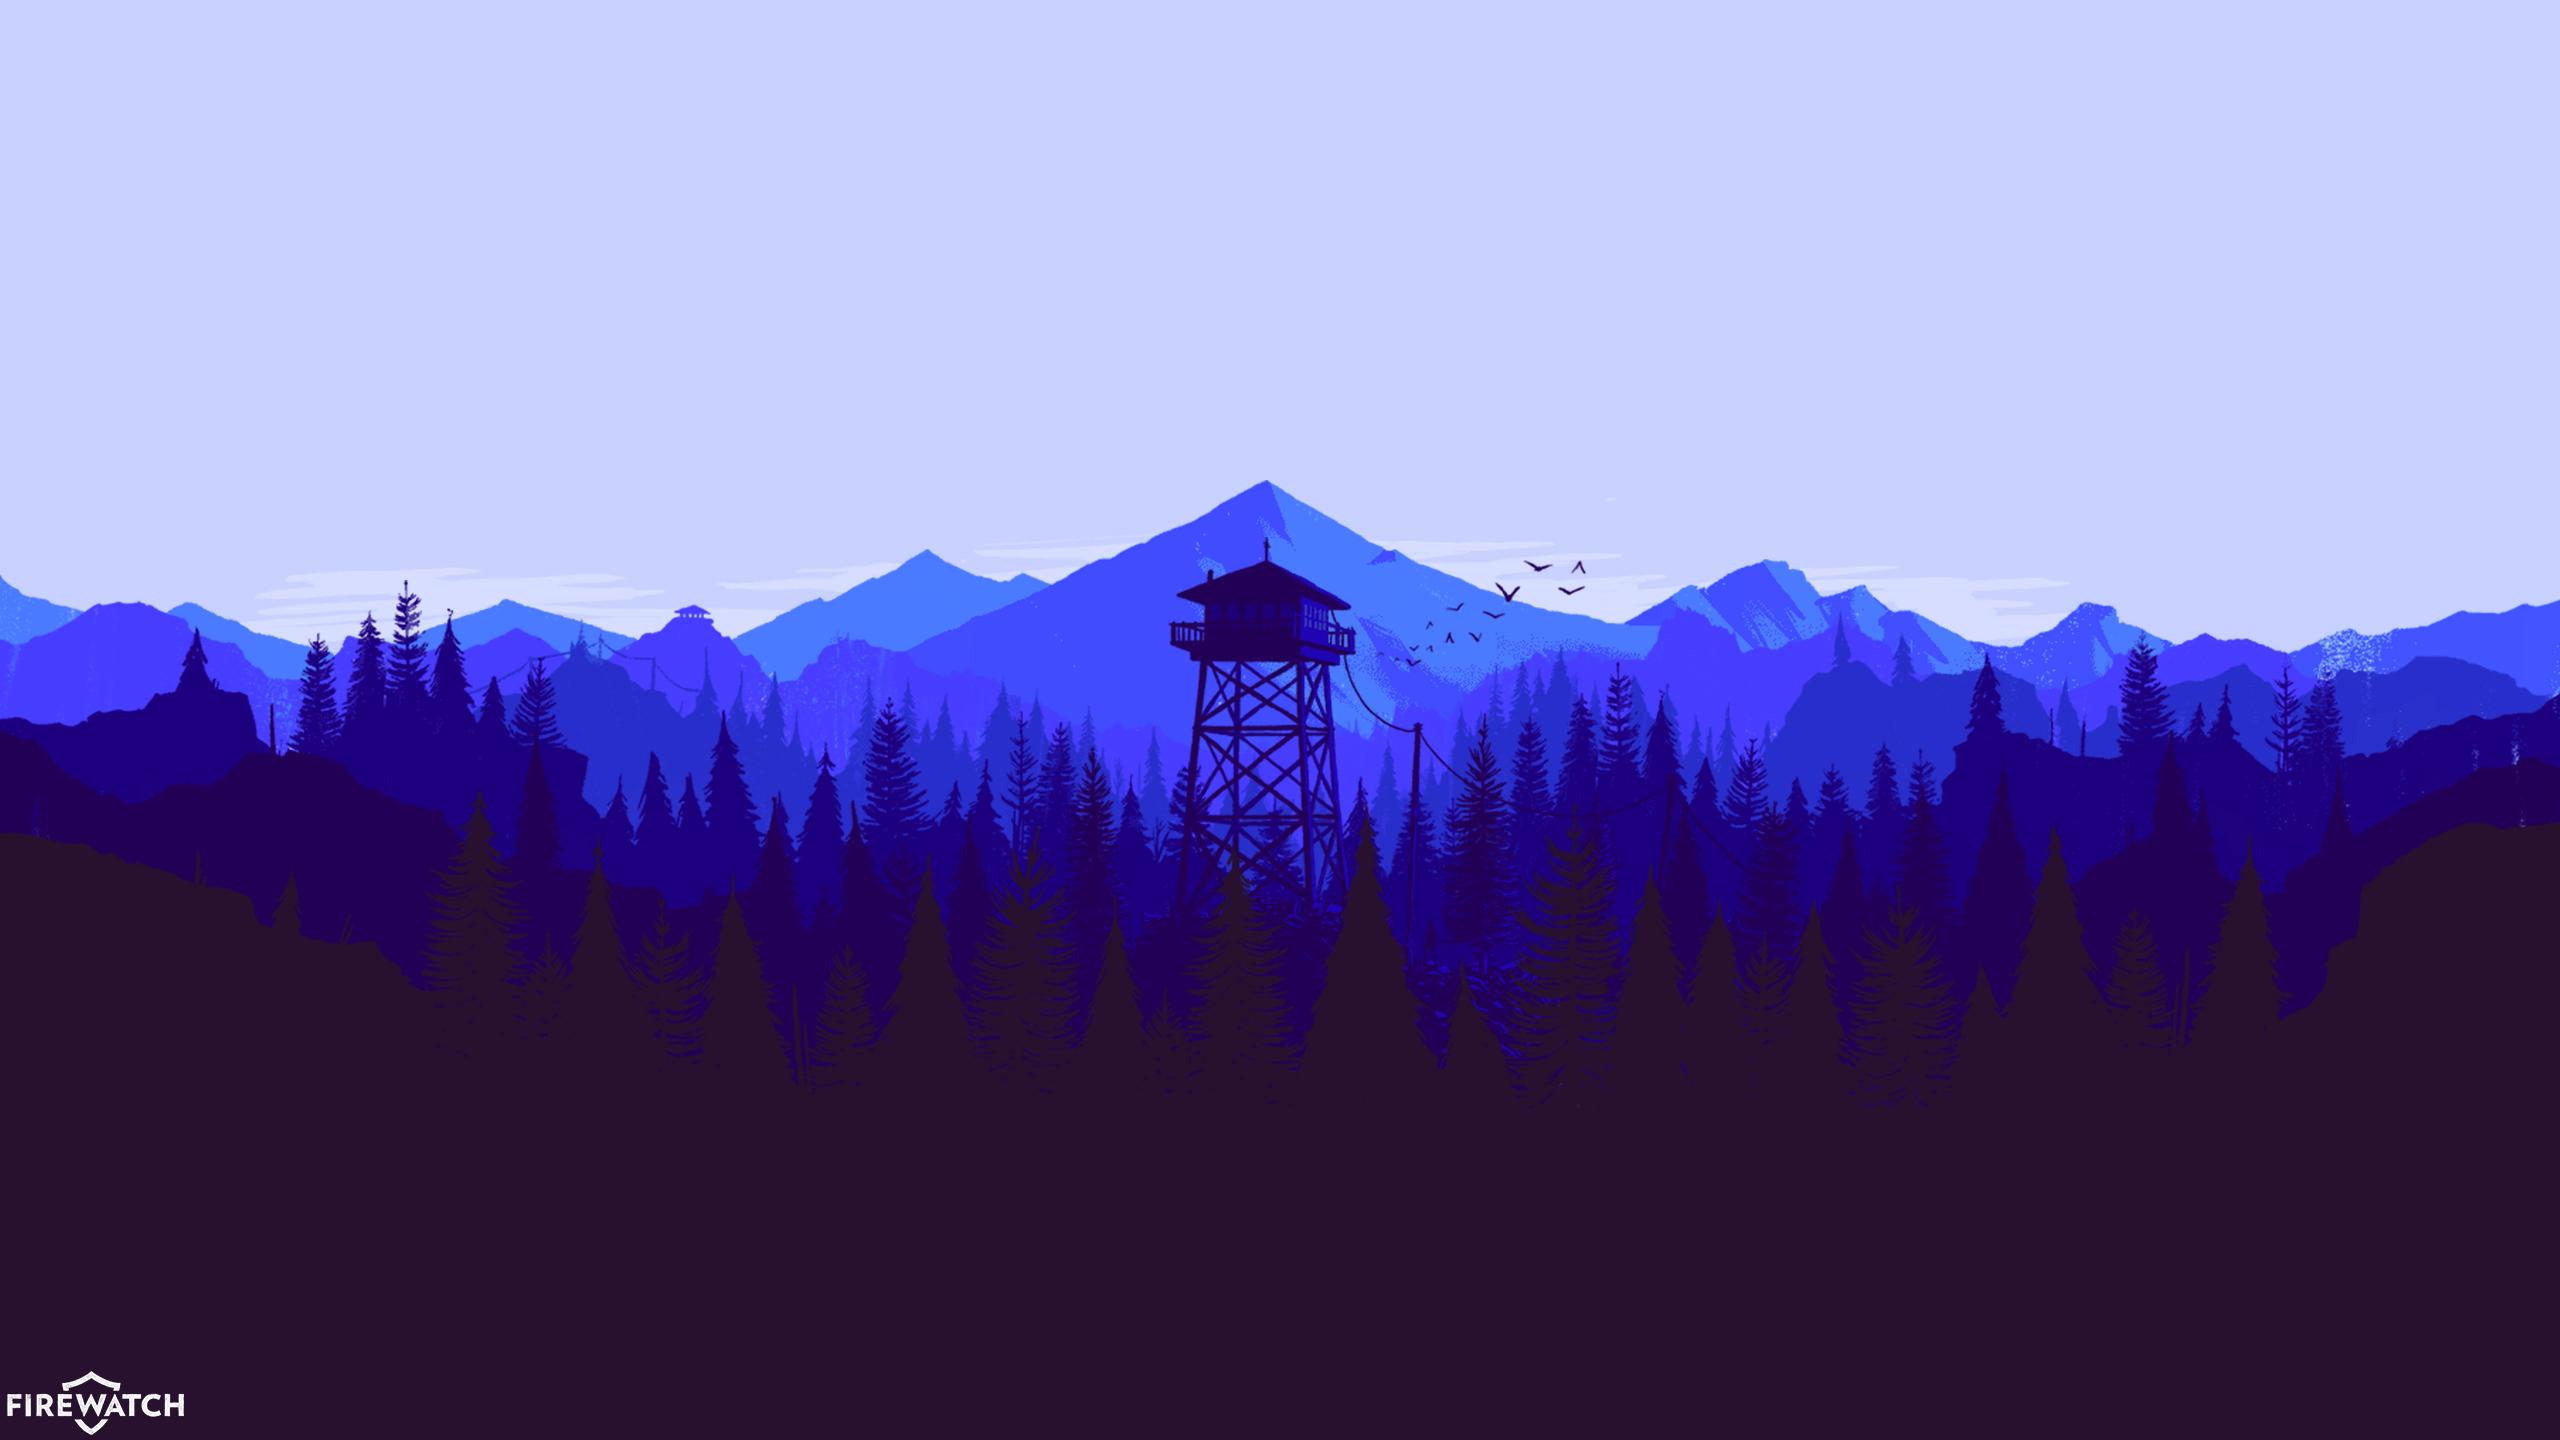 Must see Wallpaper Mountain Minimalistic - 784001  Gallery_245570.jpg